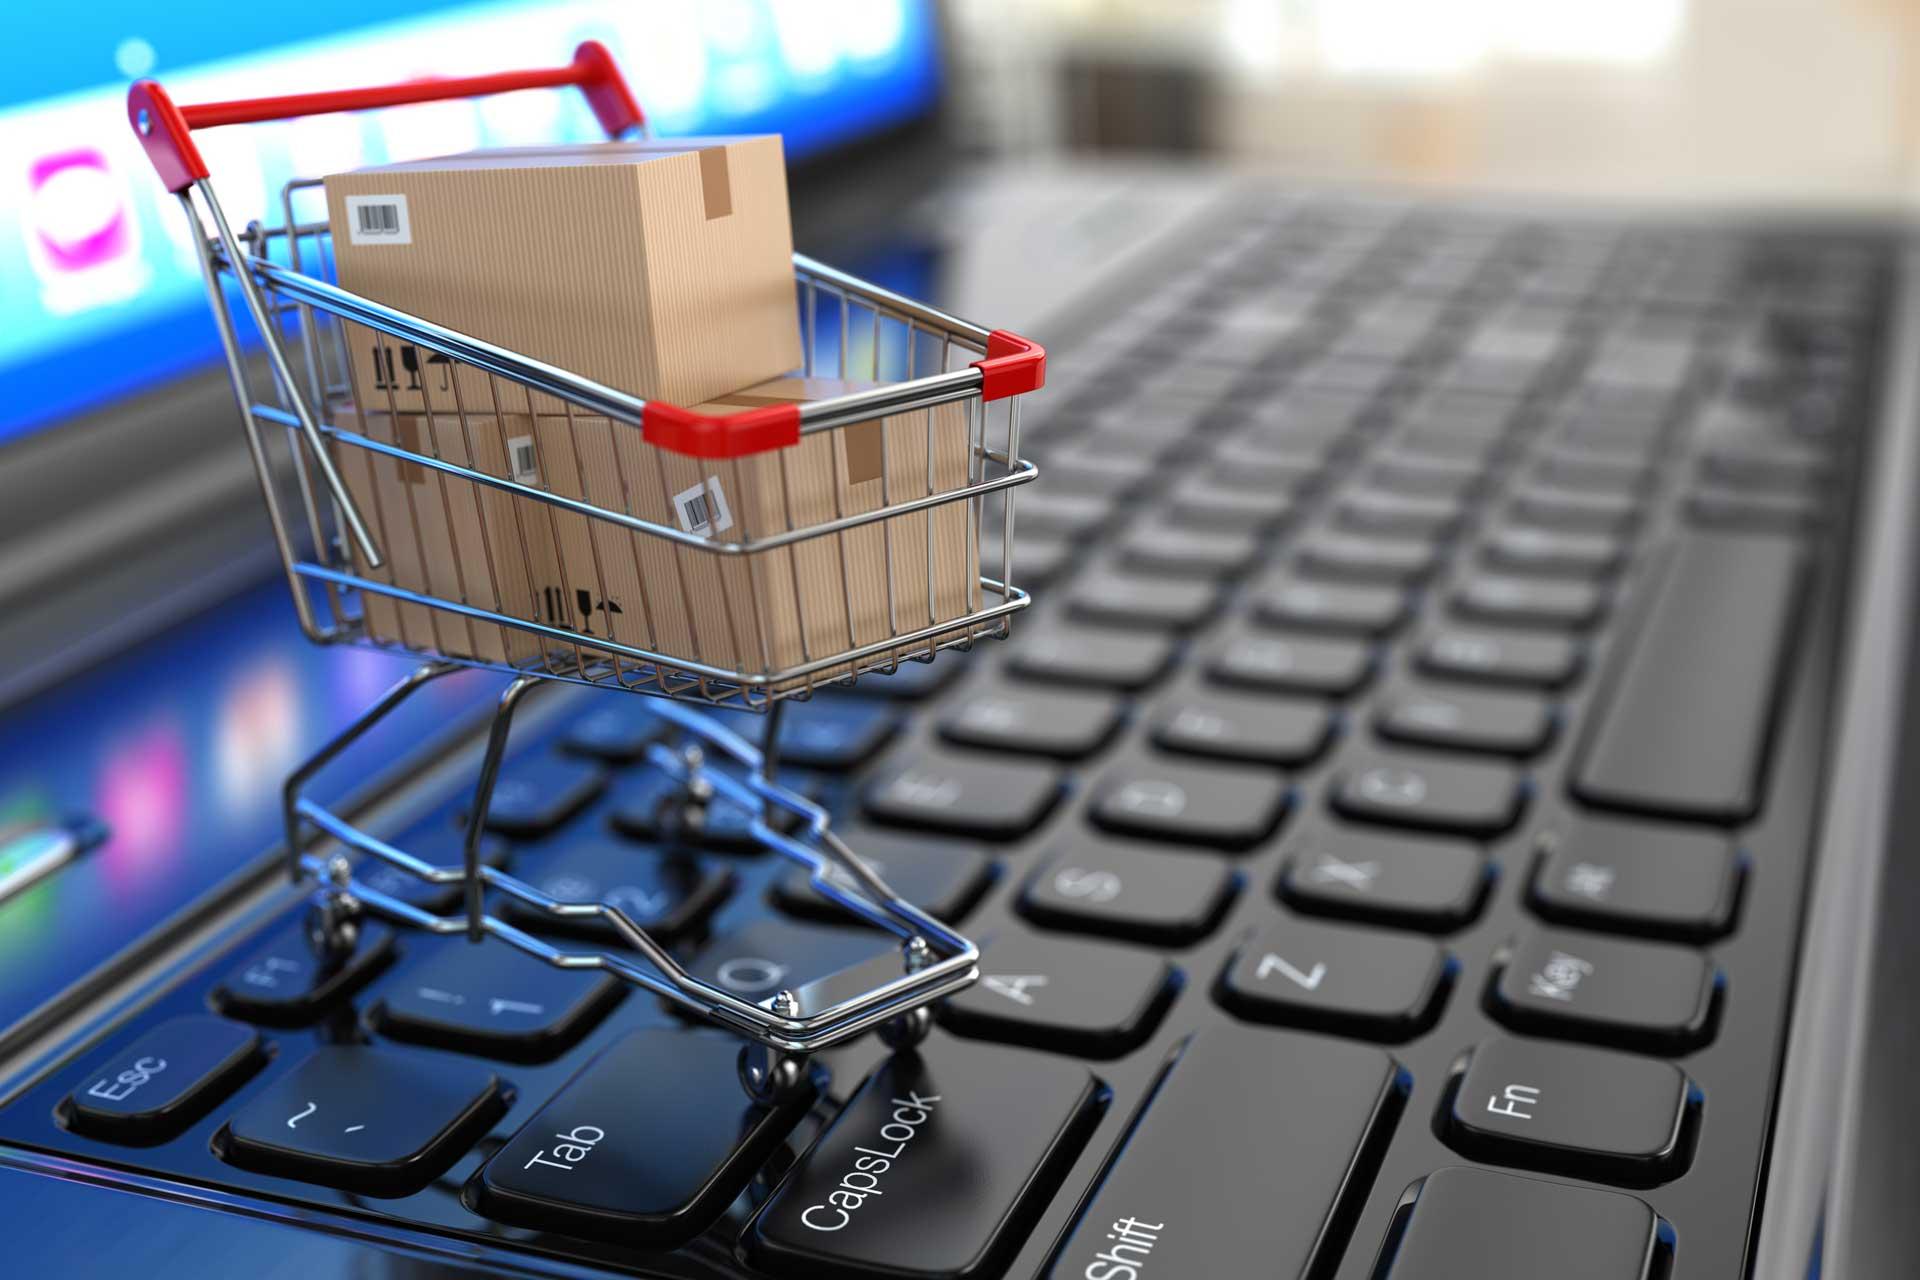 imagen carrito de compra sobre un ordenador